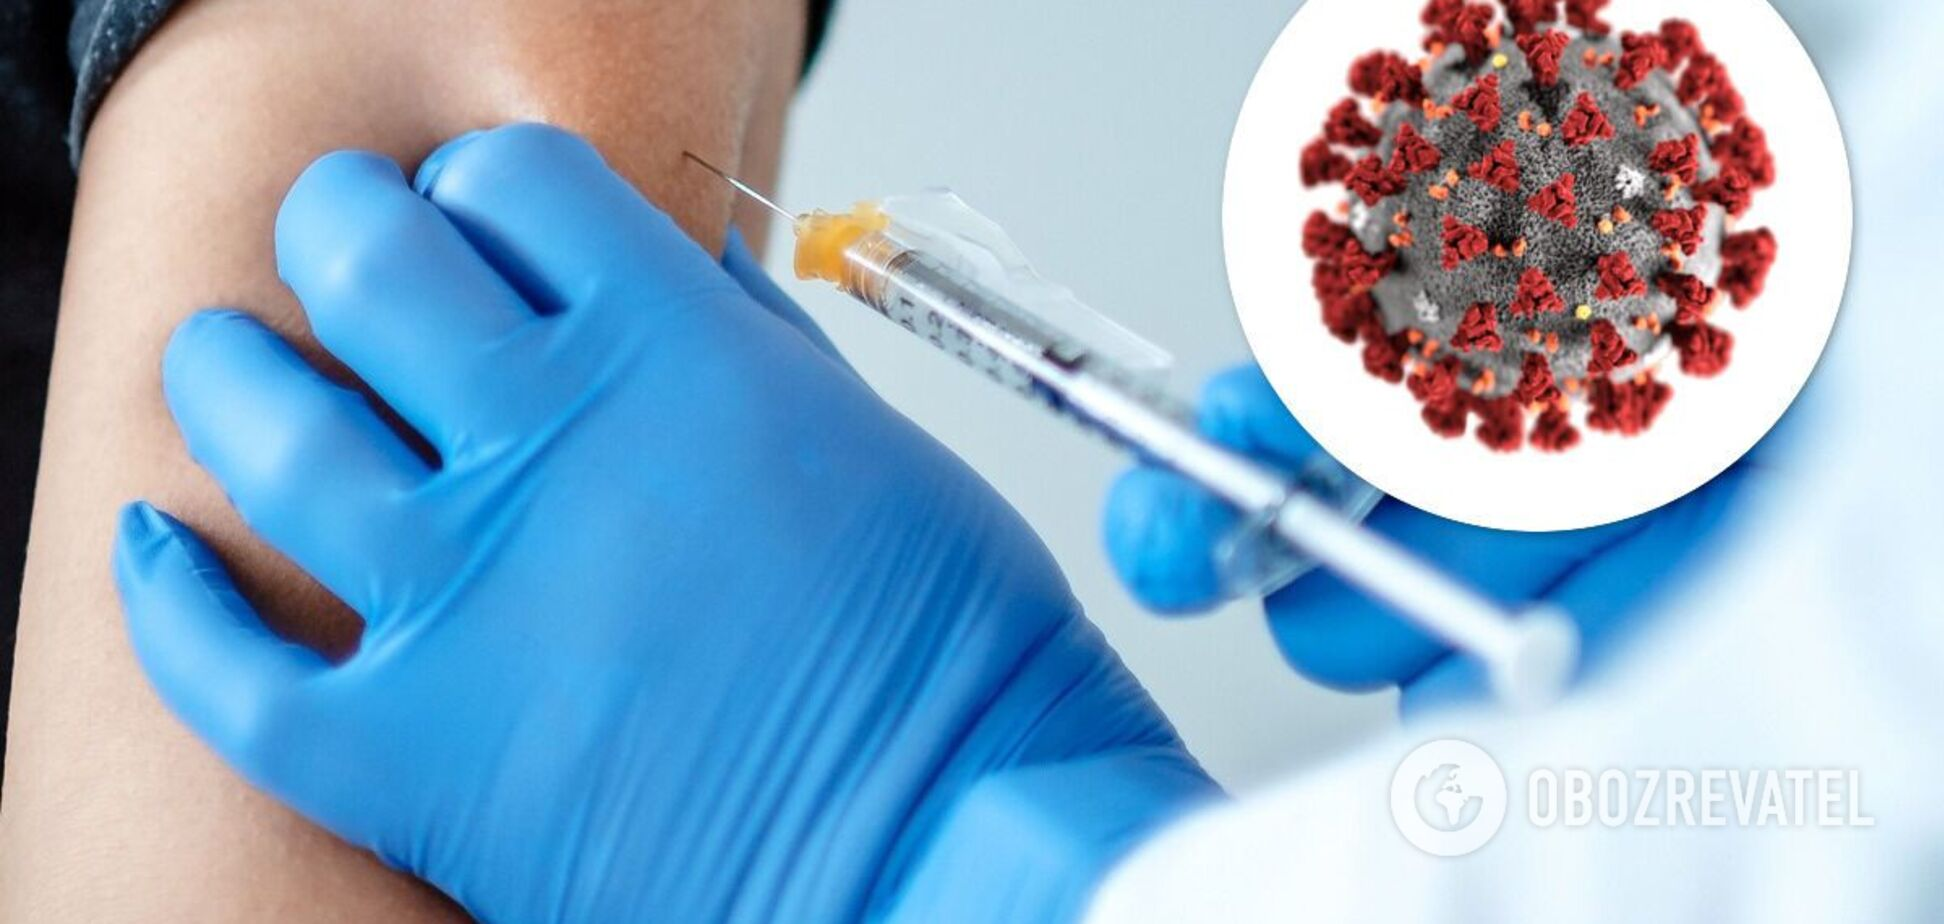 Мошенники не спят: эксперт предупредил о риске фальсификации вакцин от COVID-19